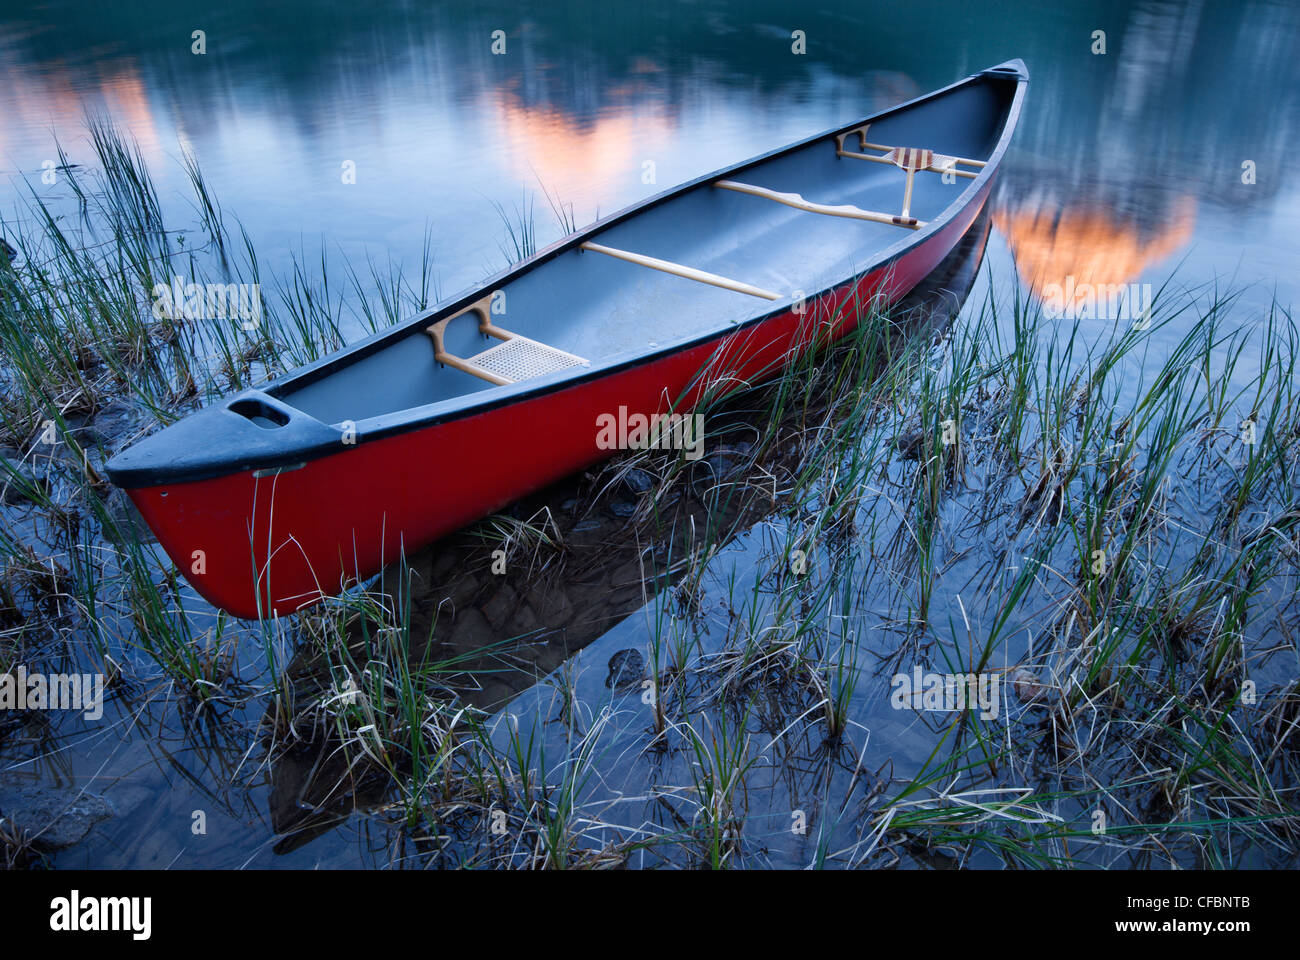 Canoe at Waterfowl Lake, Banff National Park, Alberta, Canada - Stock Image